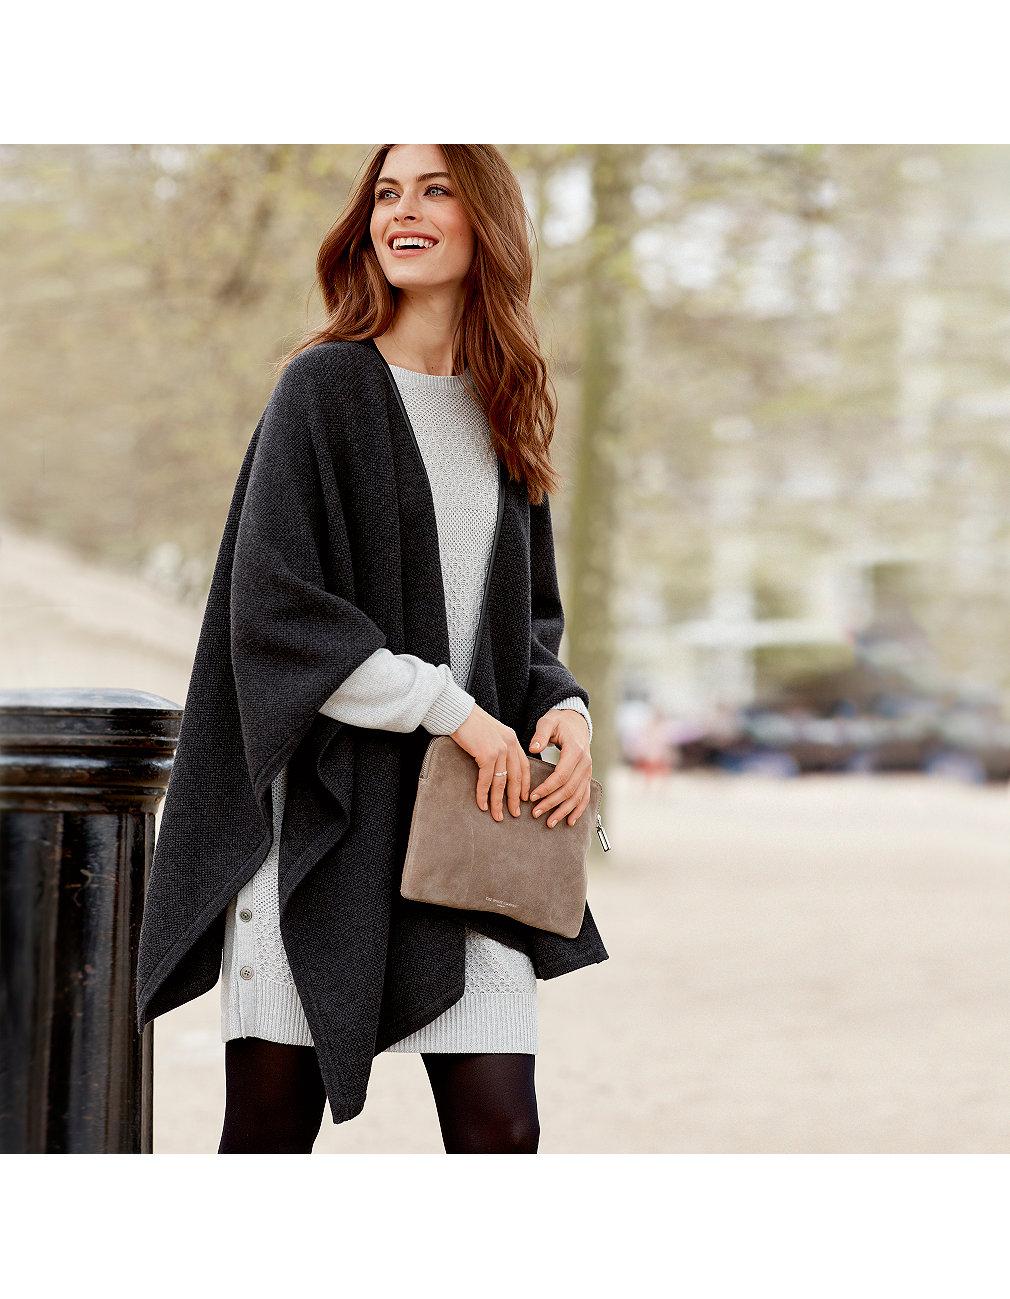 e6fcfc80a7 Leather Trim Wrap Cardigan | Clothing Sale | The White Company UK